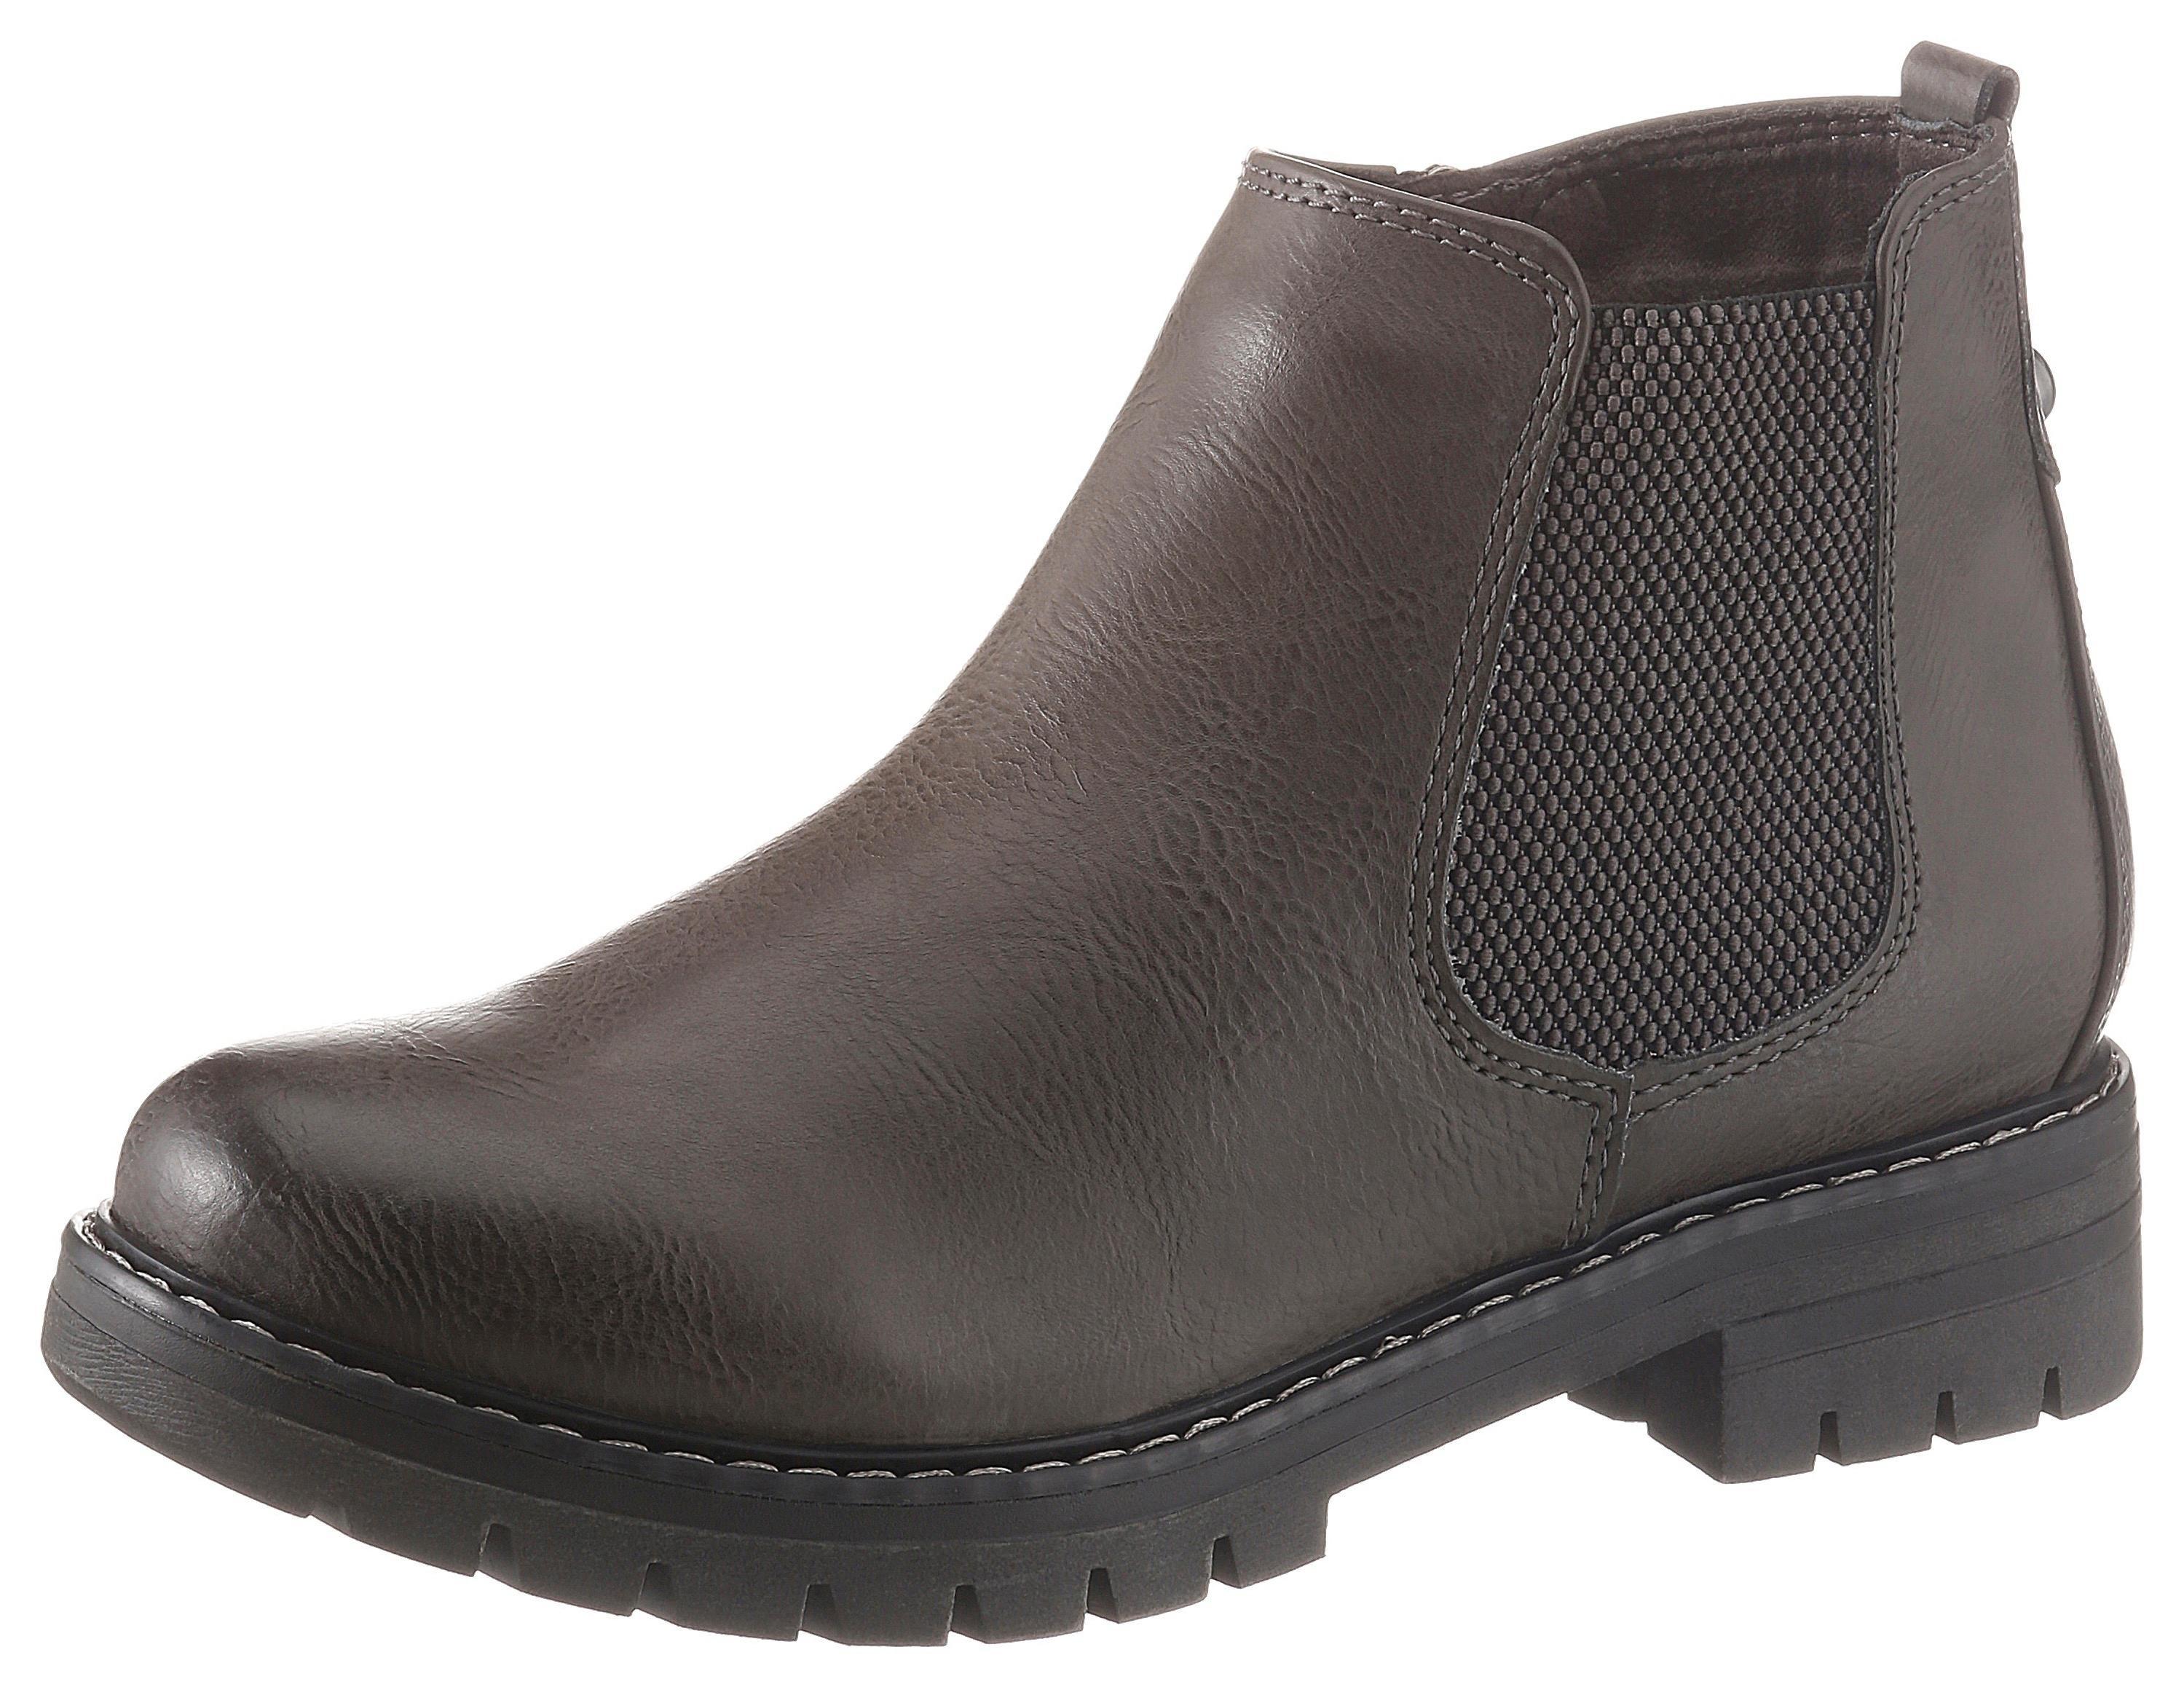 Marco Tozzi chelsea-boots - gratis ruilen op otto.nl